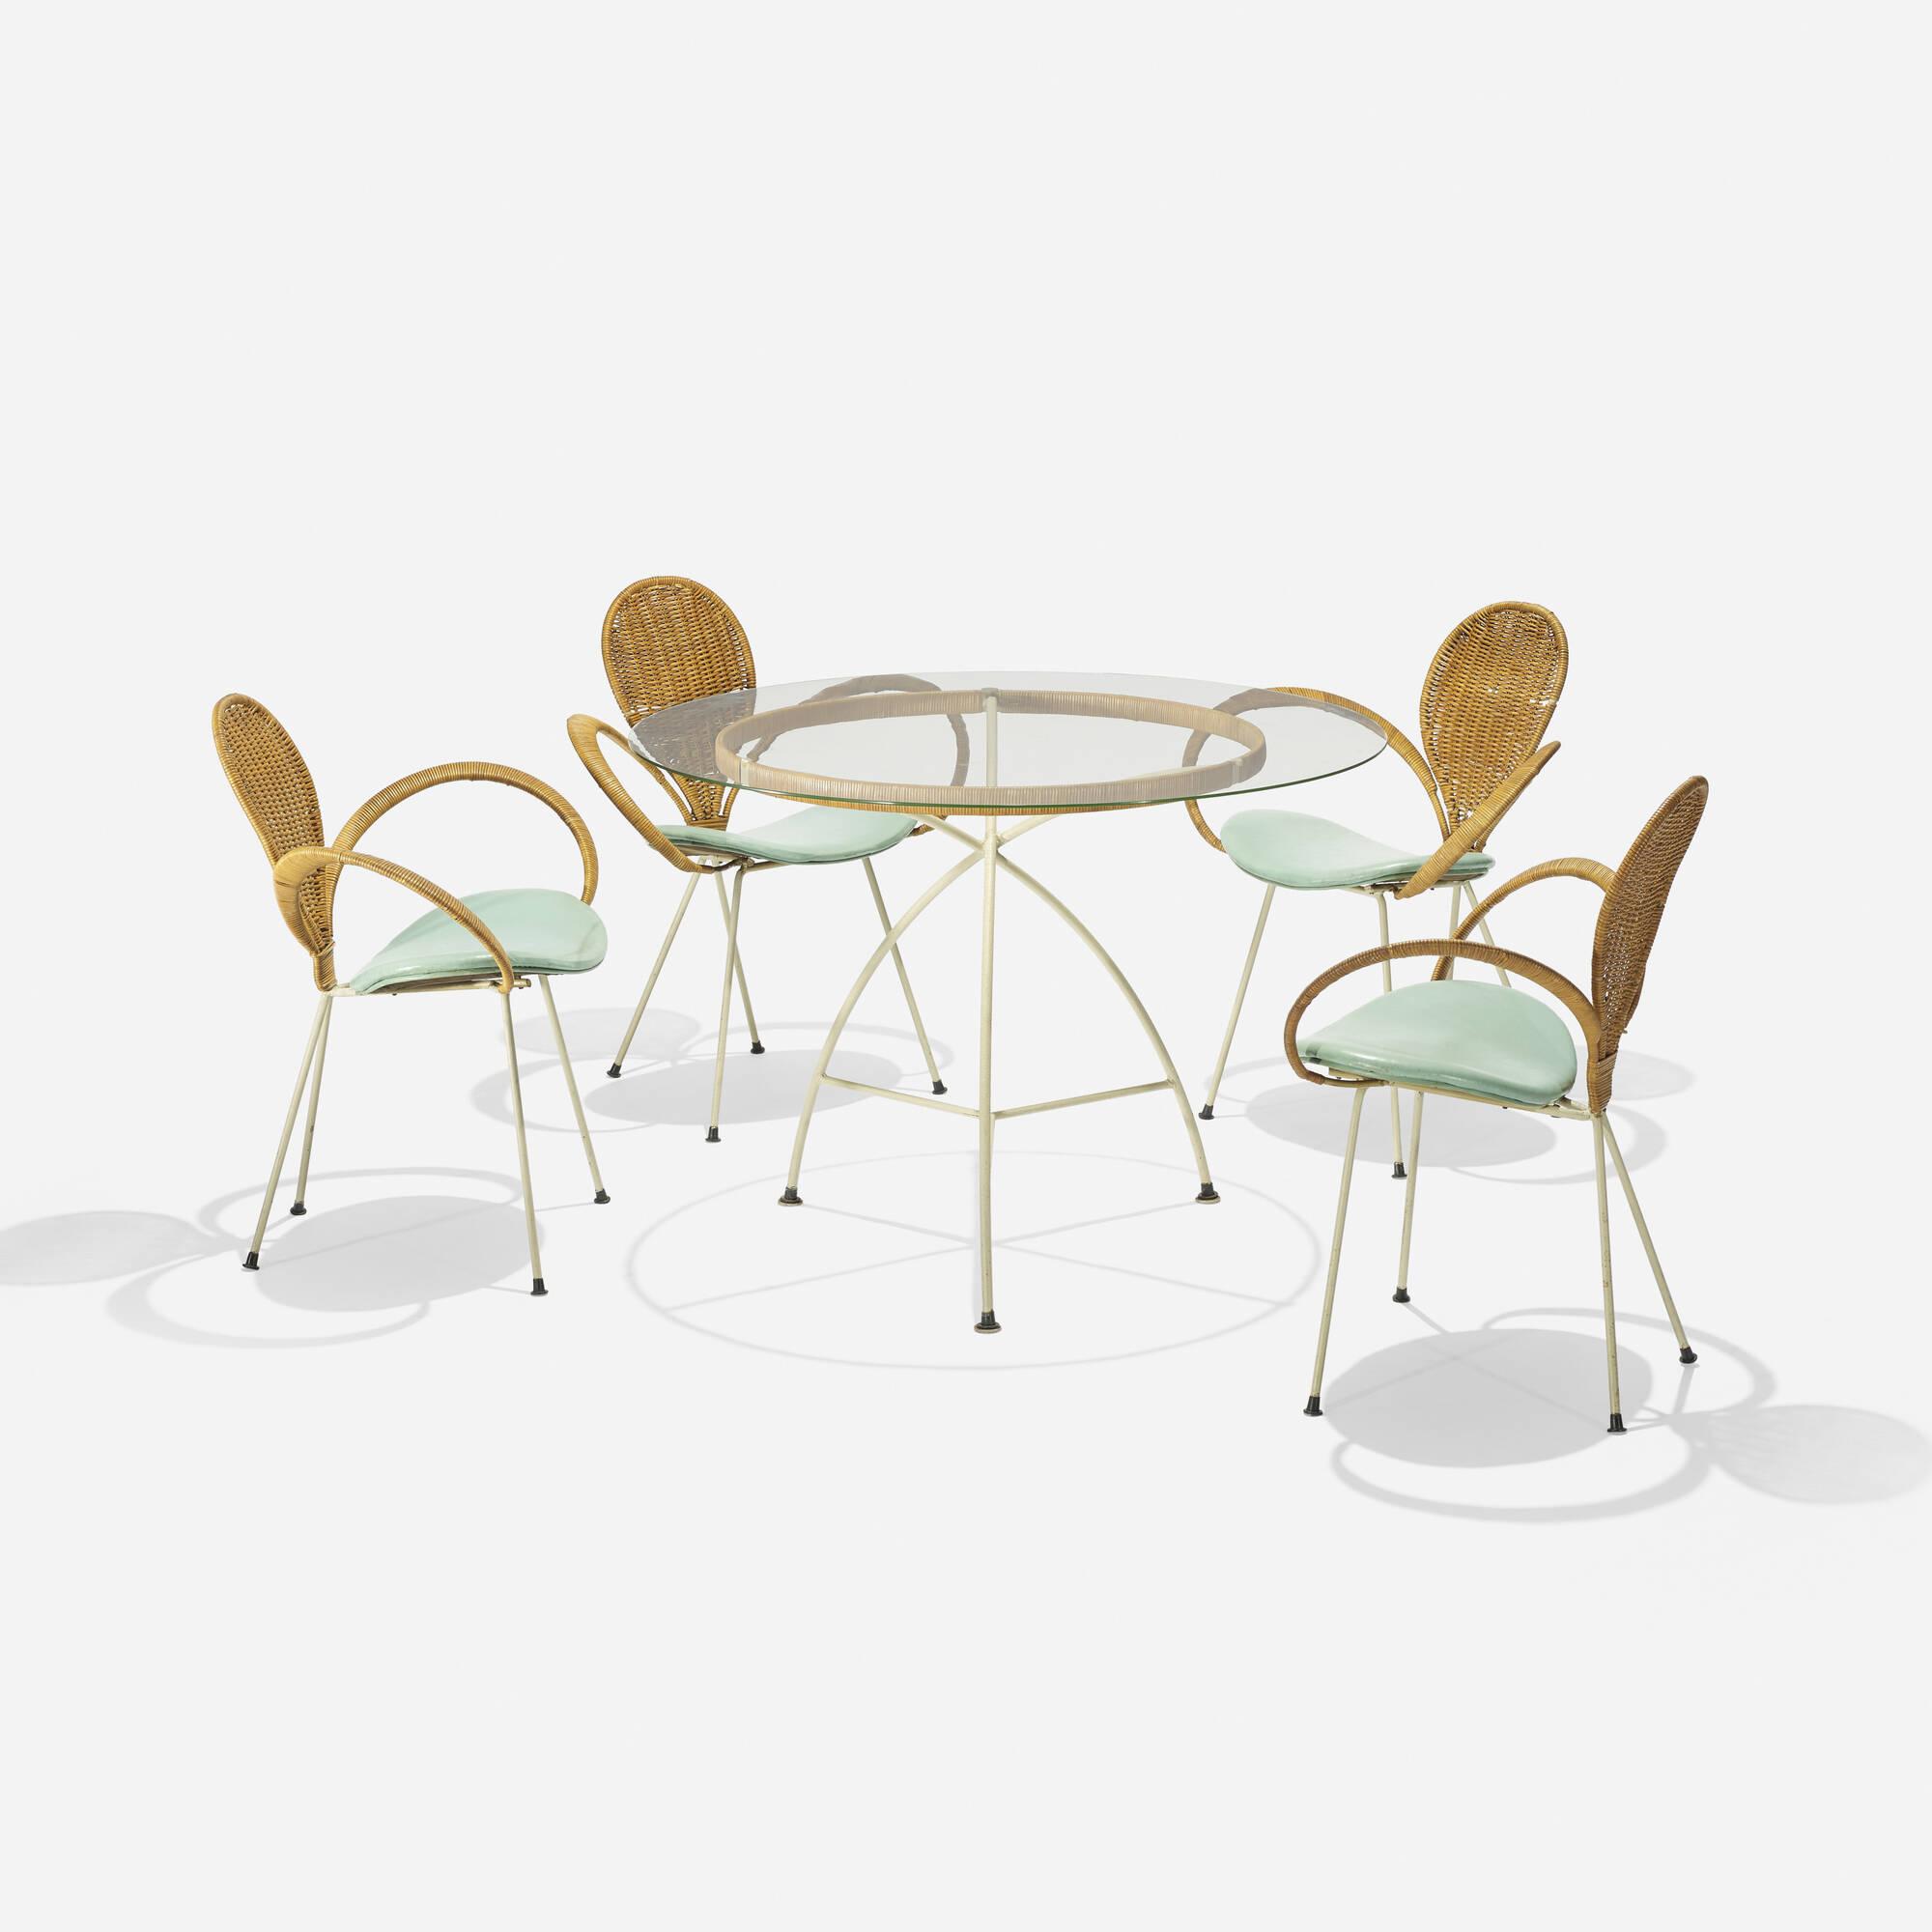 764: Arthur Umanoff, attribution / dining set (1 of 2)